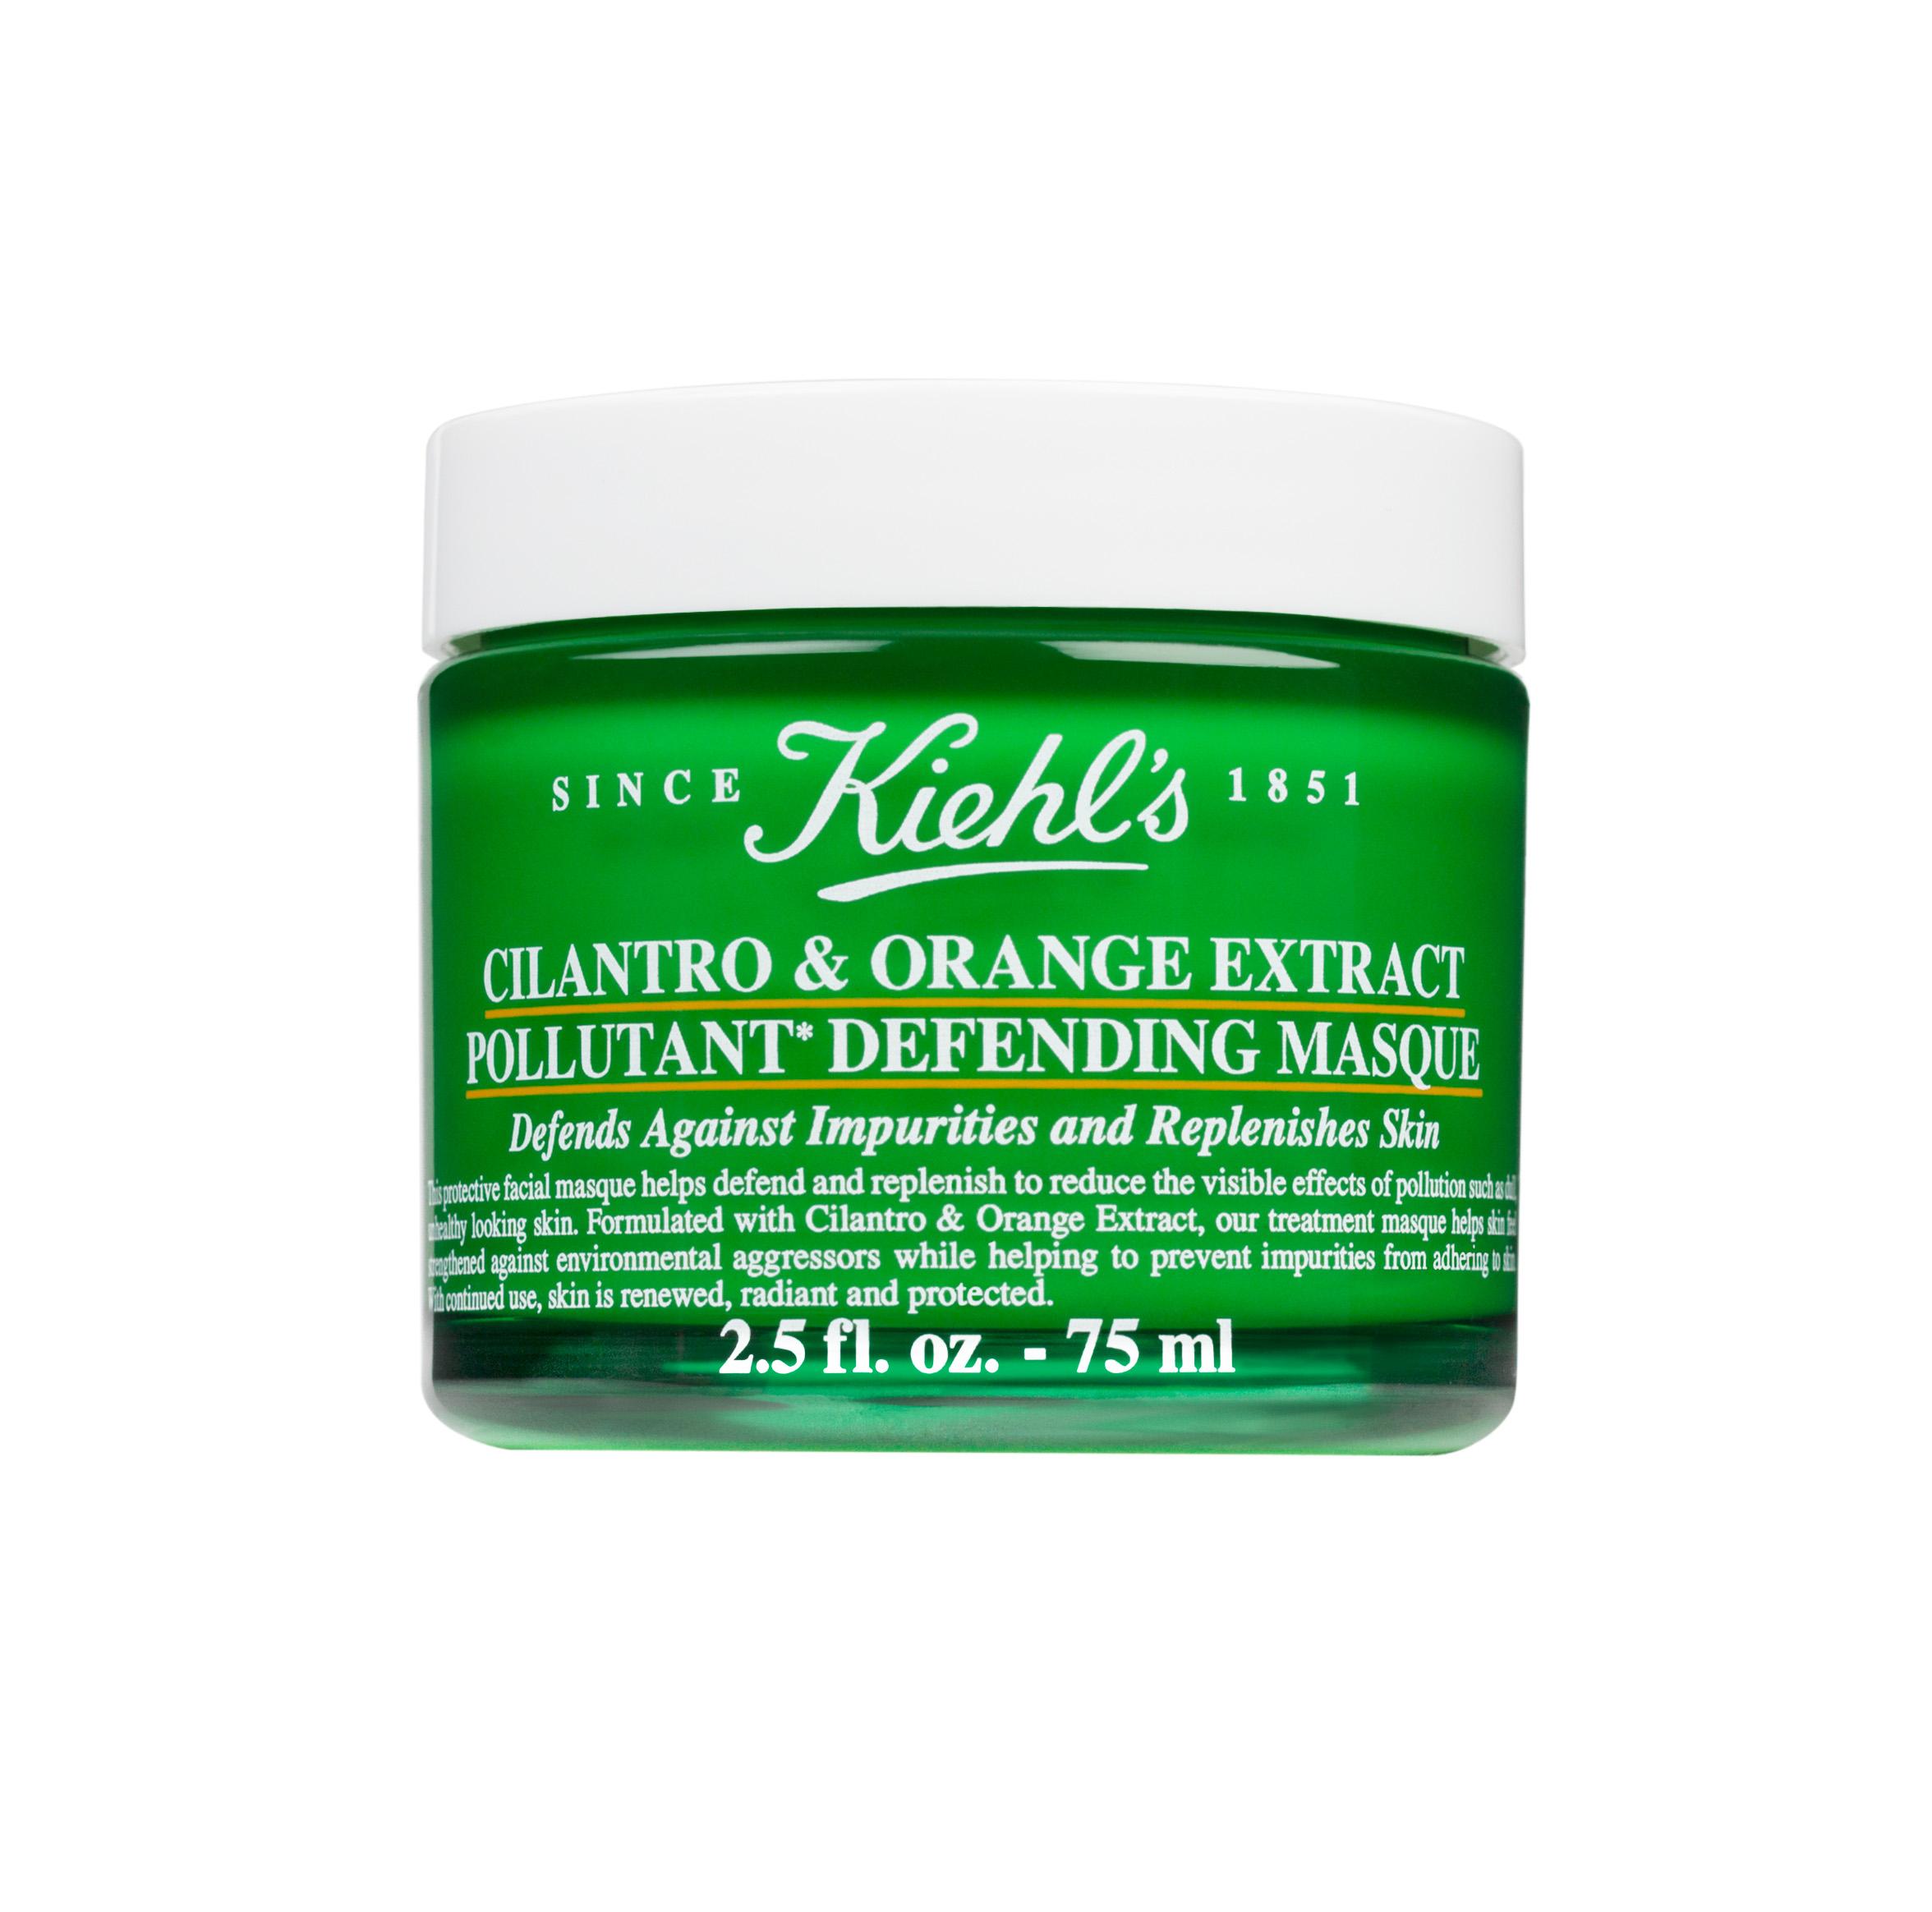 cilantro-orange-extract-pollutant-defending-masque-%cf%84%ce%b7%cf%82-kiehls